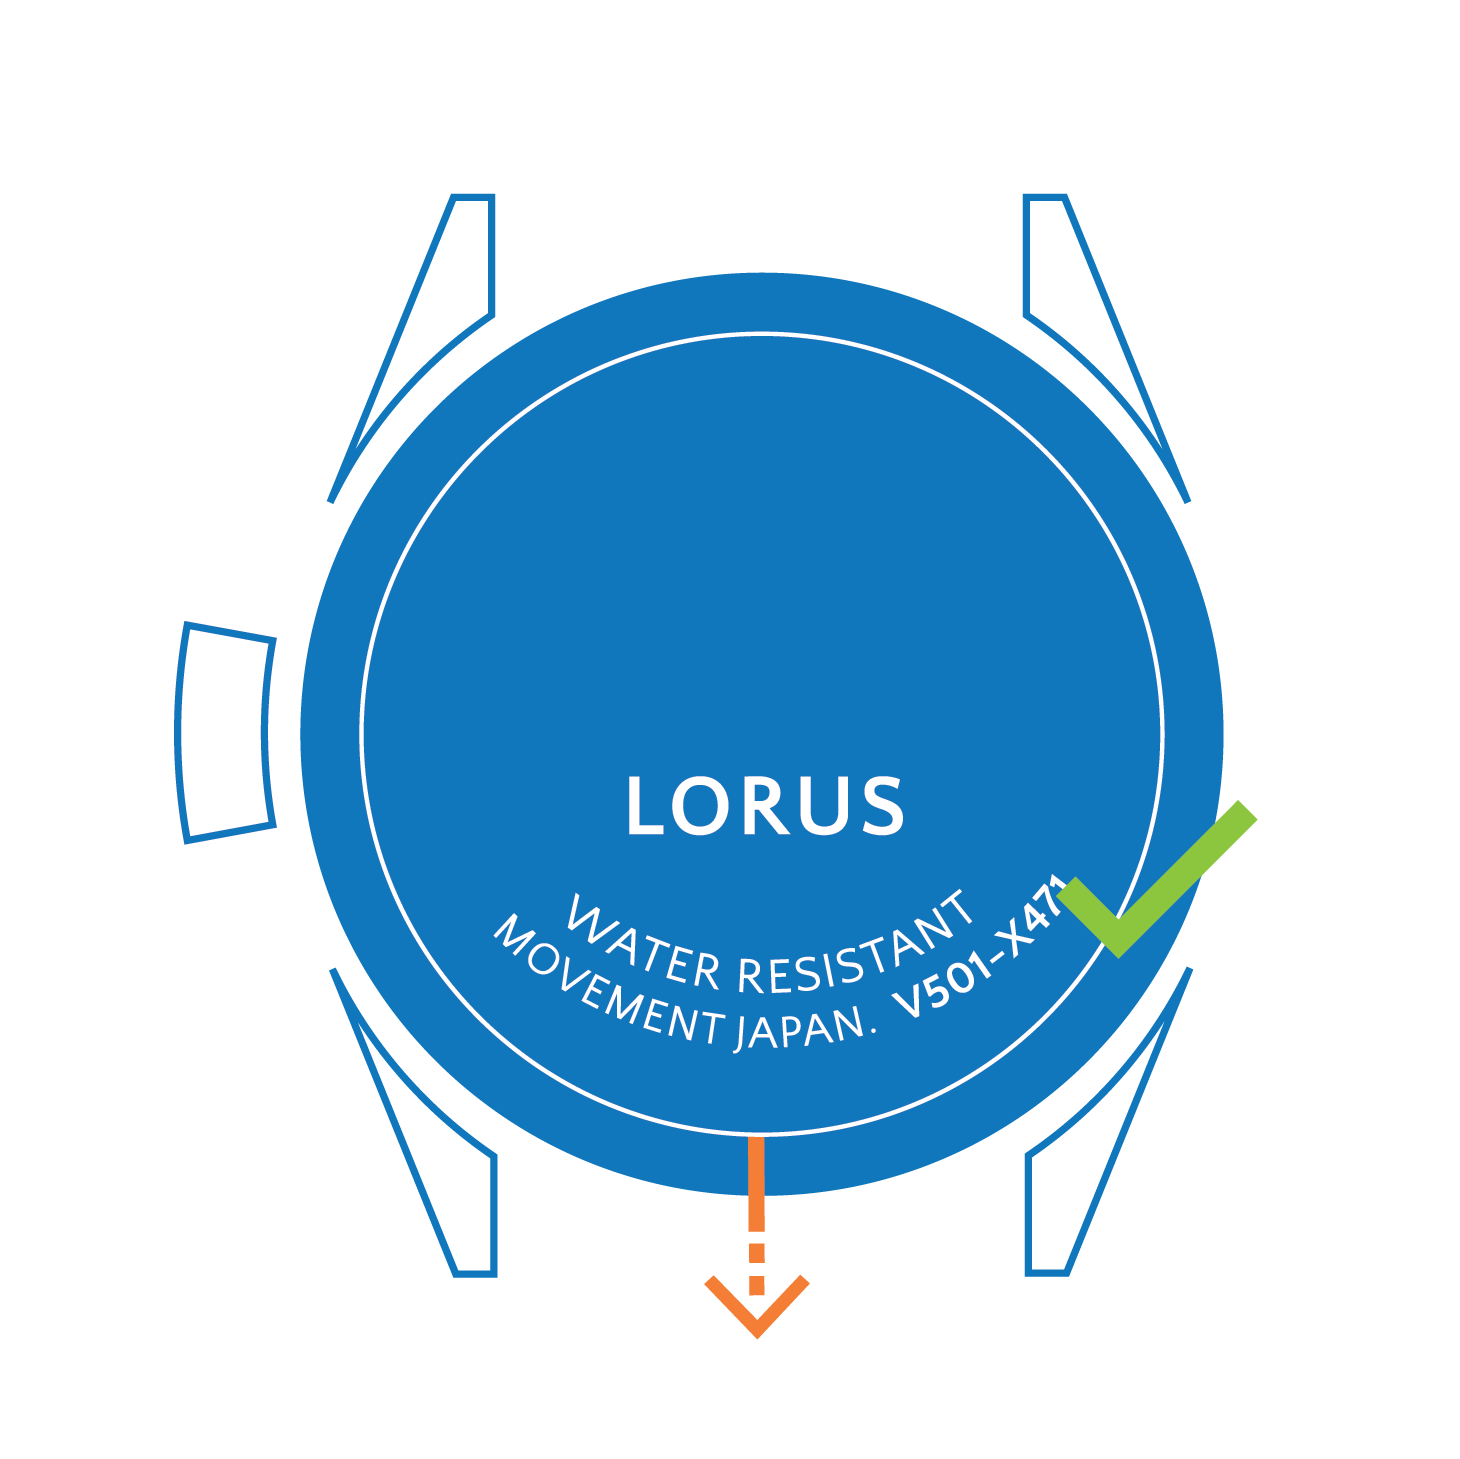 Originele Lorus horlogebanden Horlogeband Lorus